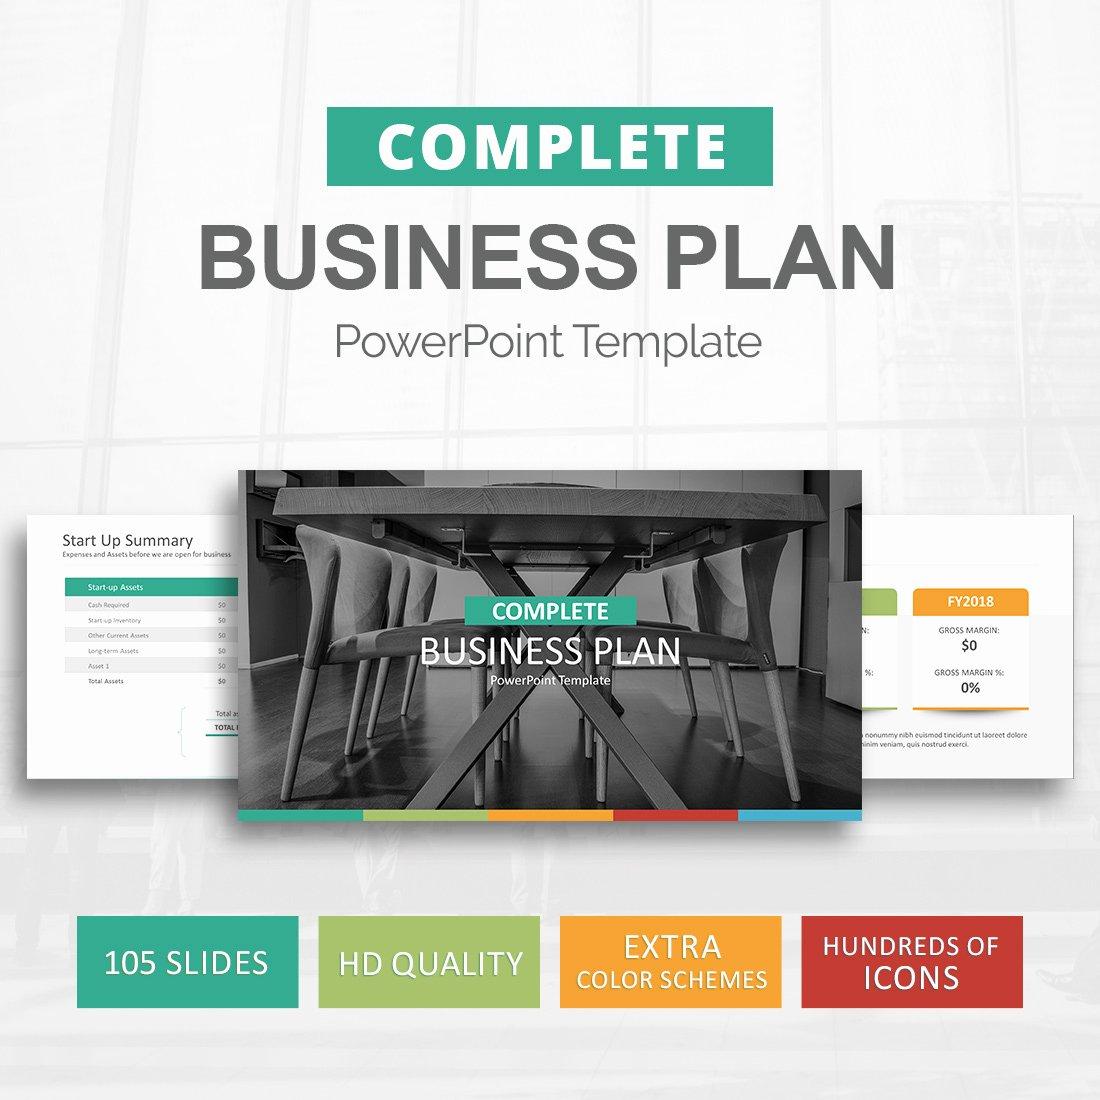 Business Plan Powerpoint Template Best Of Business Plan Template for Powerpoint Slideson